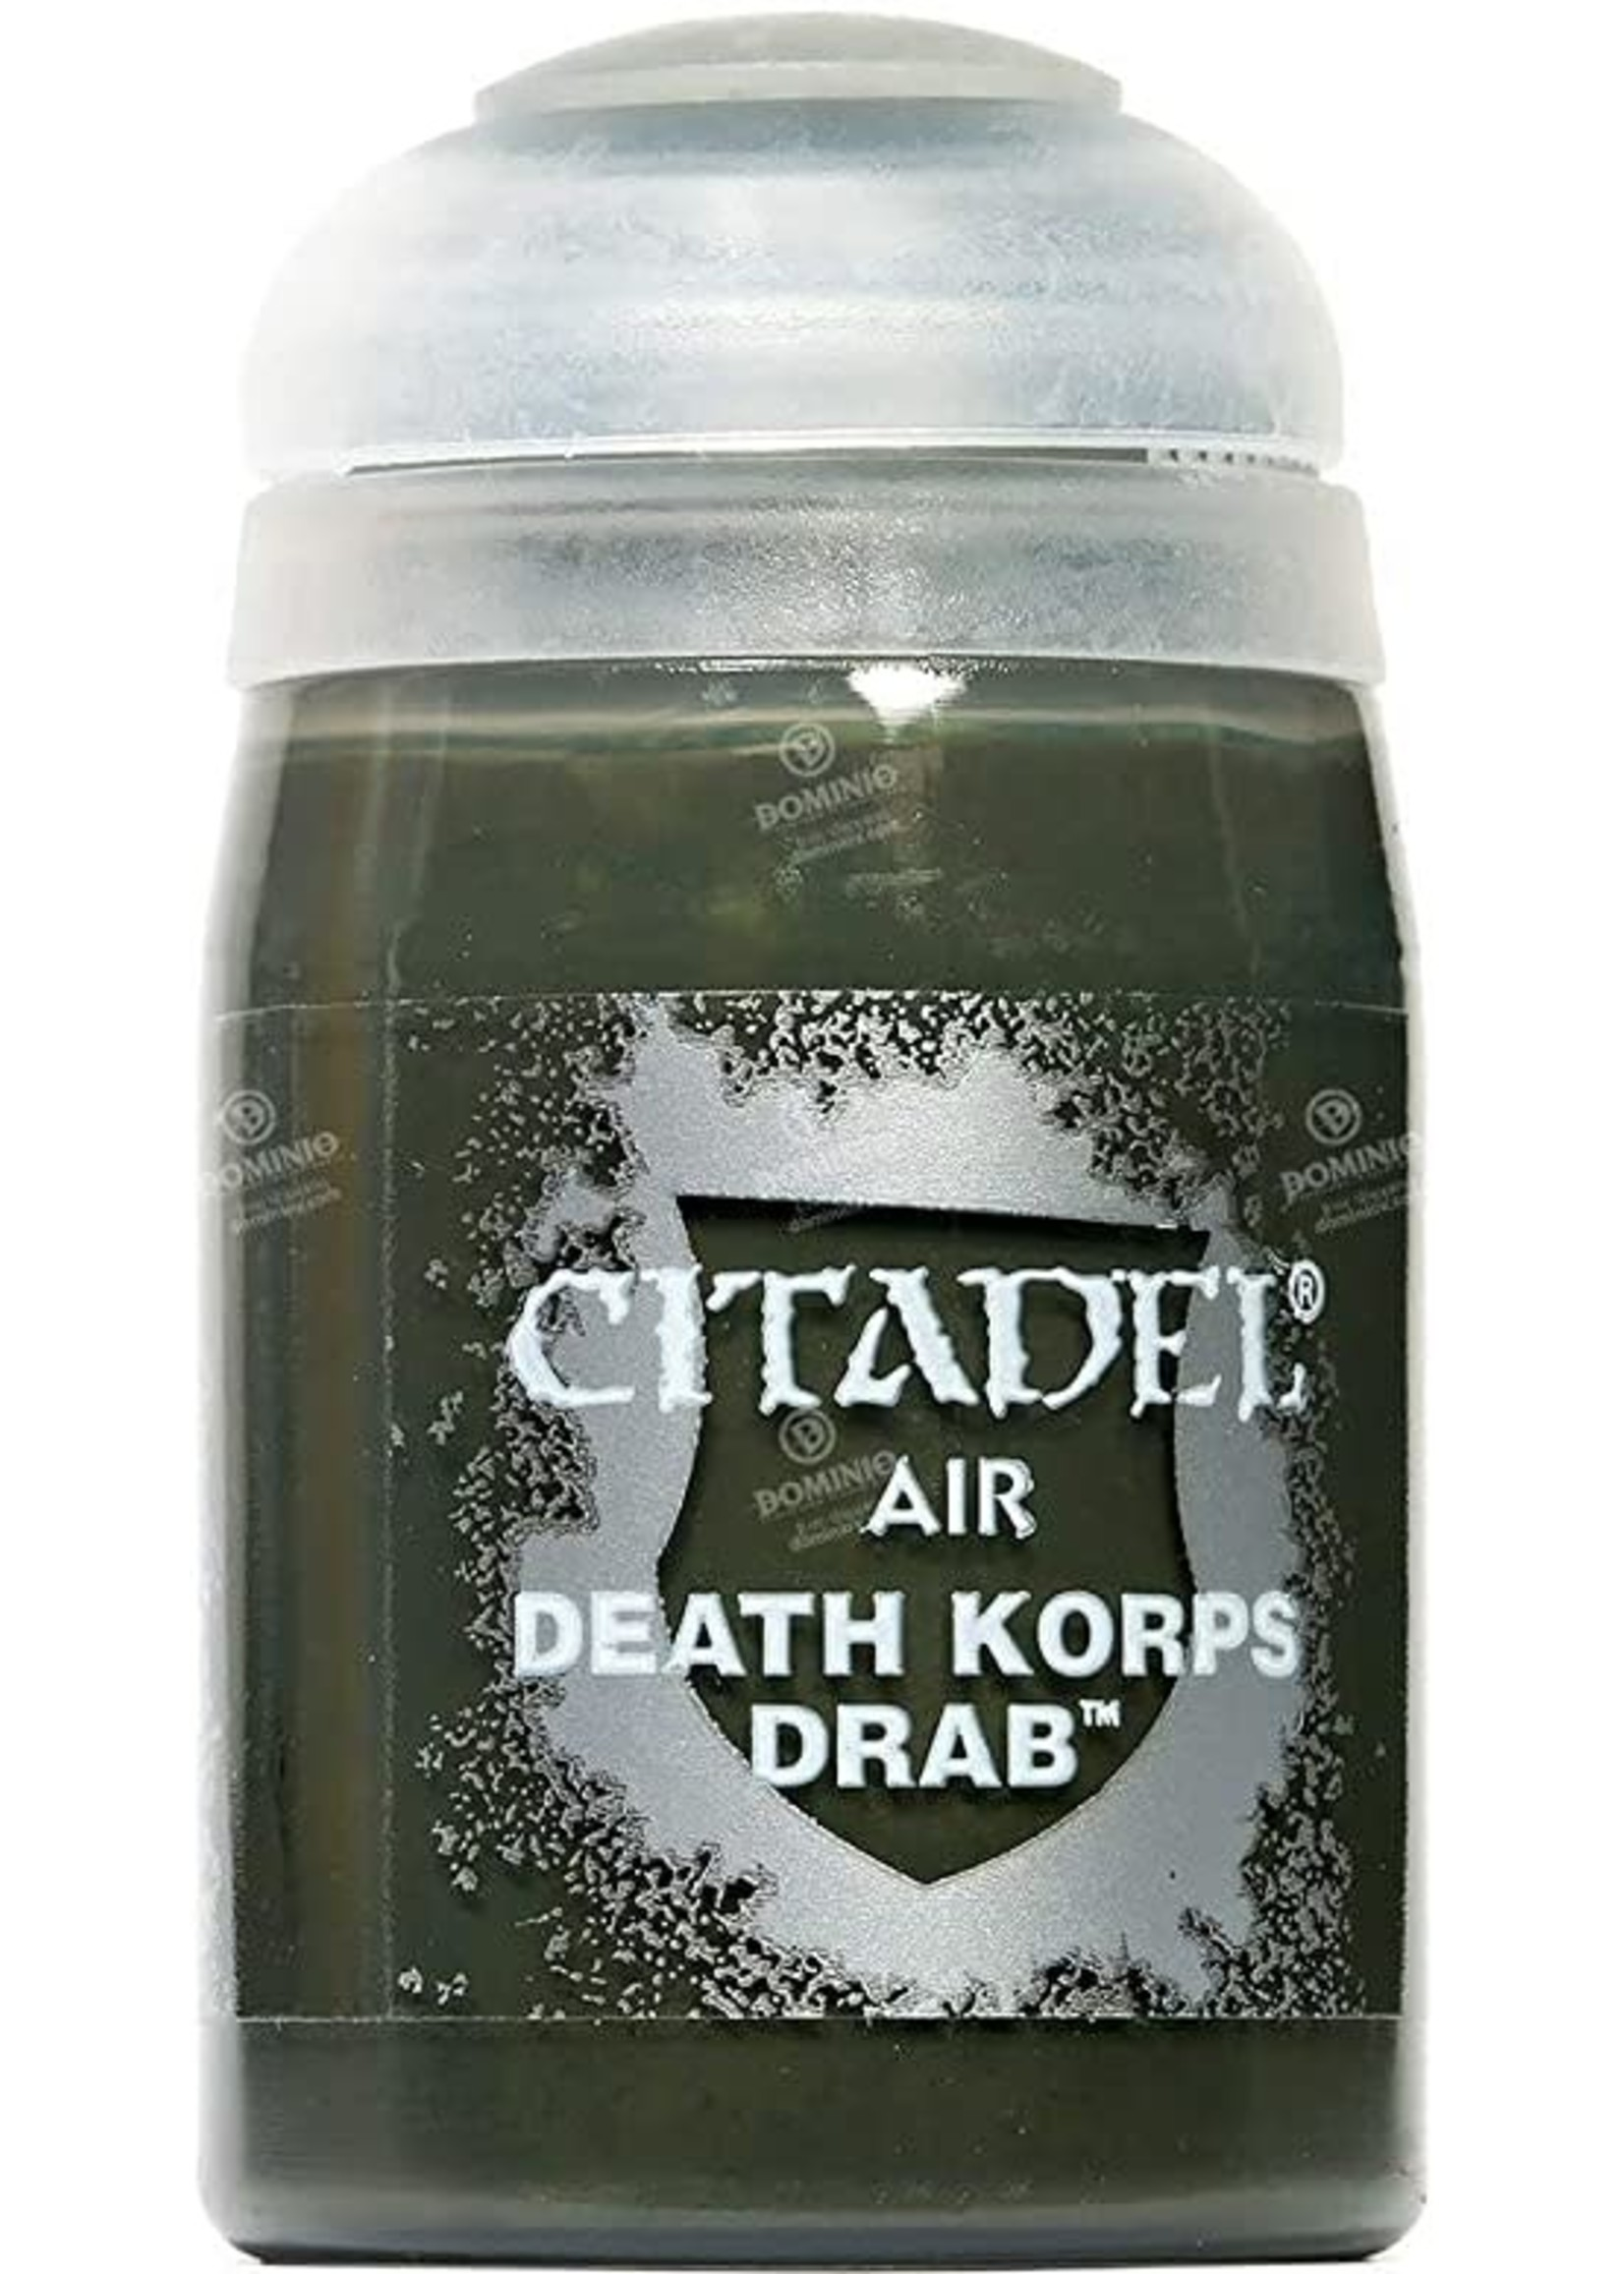 Games Workshop Citadel Paint: Death Korps Drab Air (24 ml)